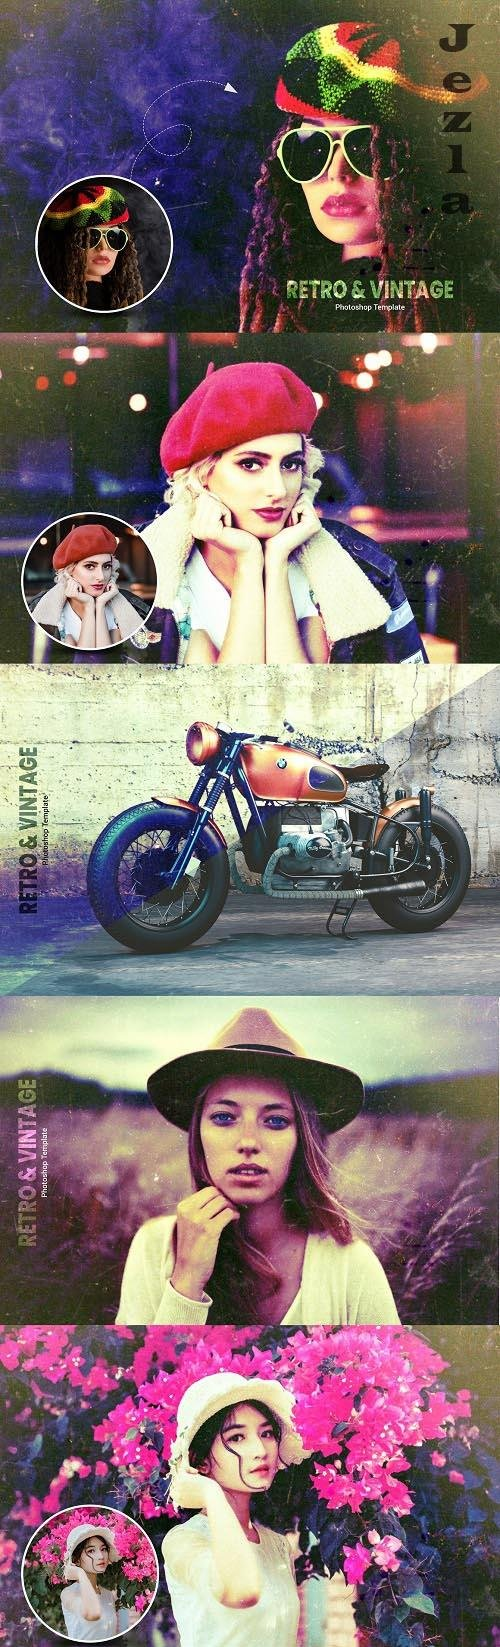 Retro and Vintage Photo Effect - 6369450